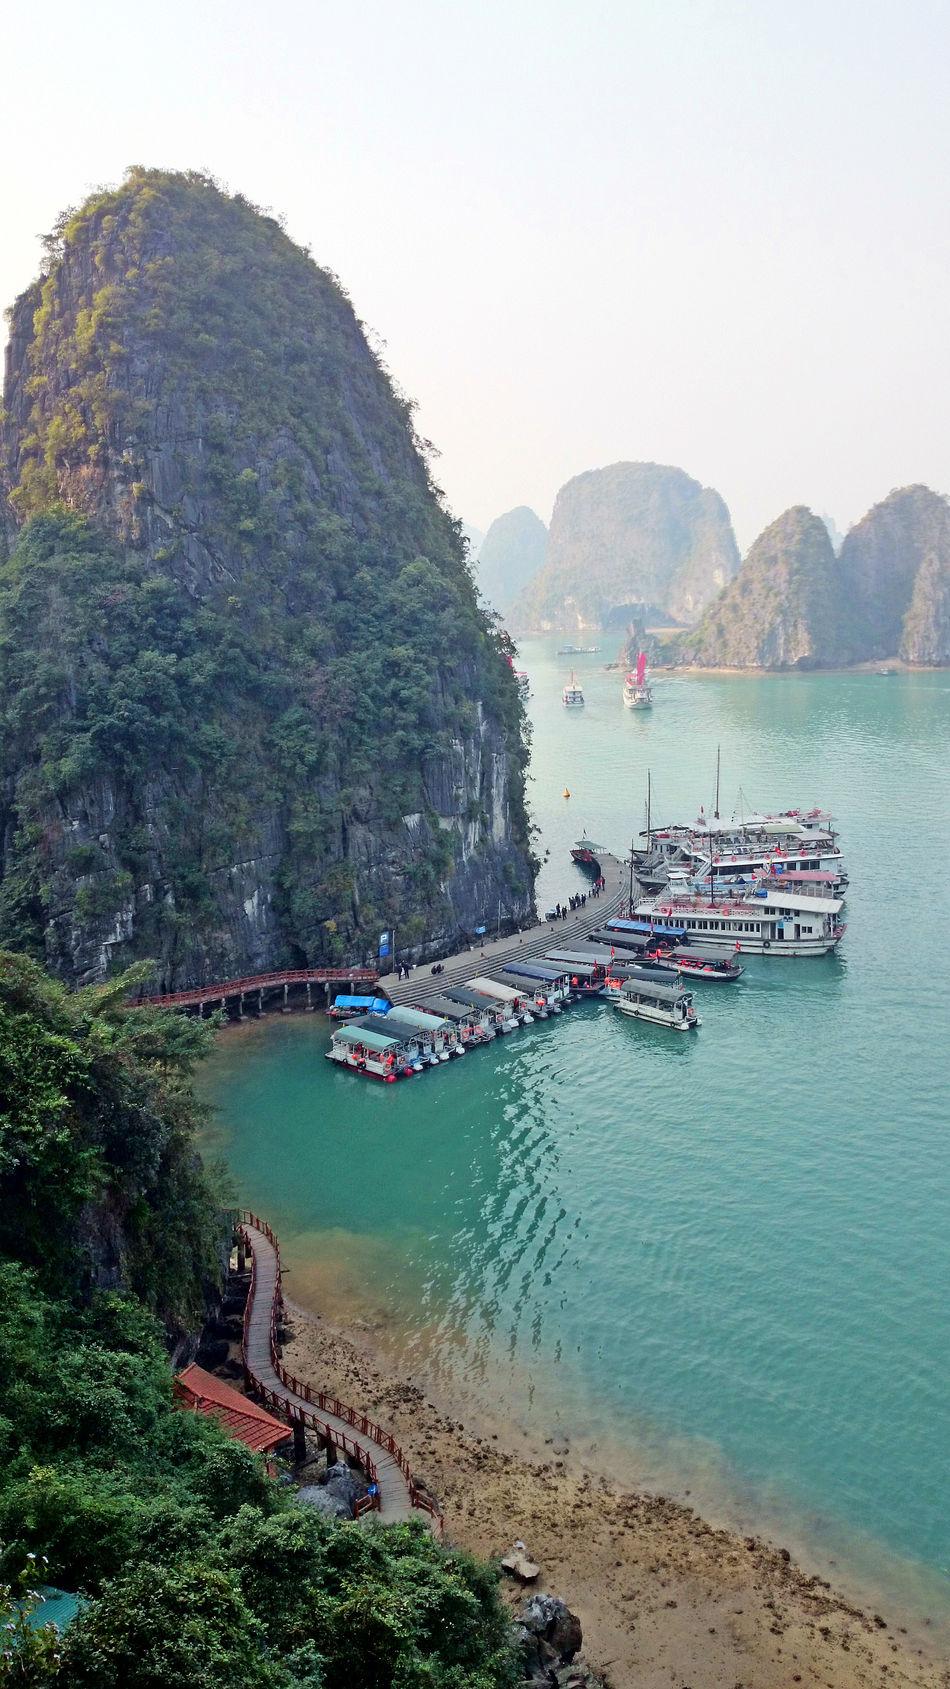 Bay Cruise Destination Halong Halong Bay Vietnam Halongbay Landscape Life Living Mountain Scenics Sea Tourist Attraction  Travel Vietnam Water